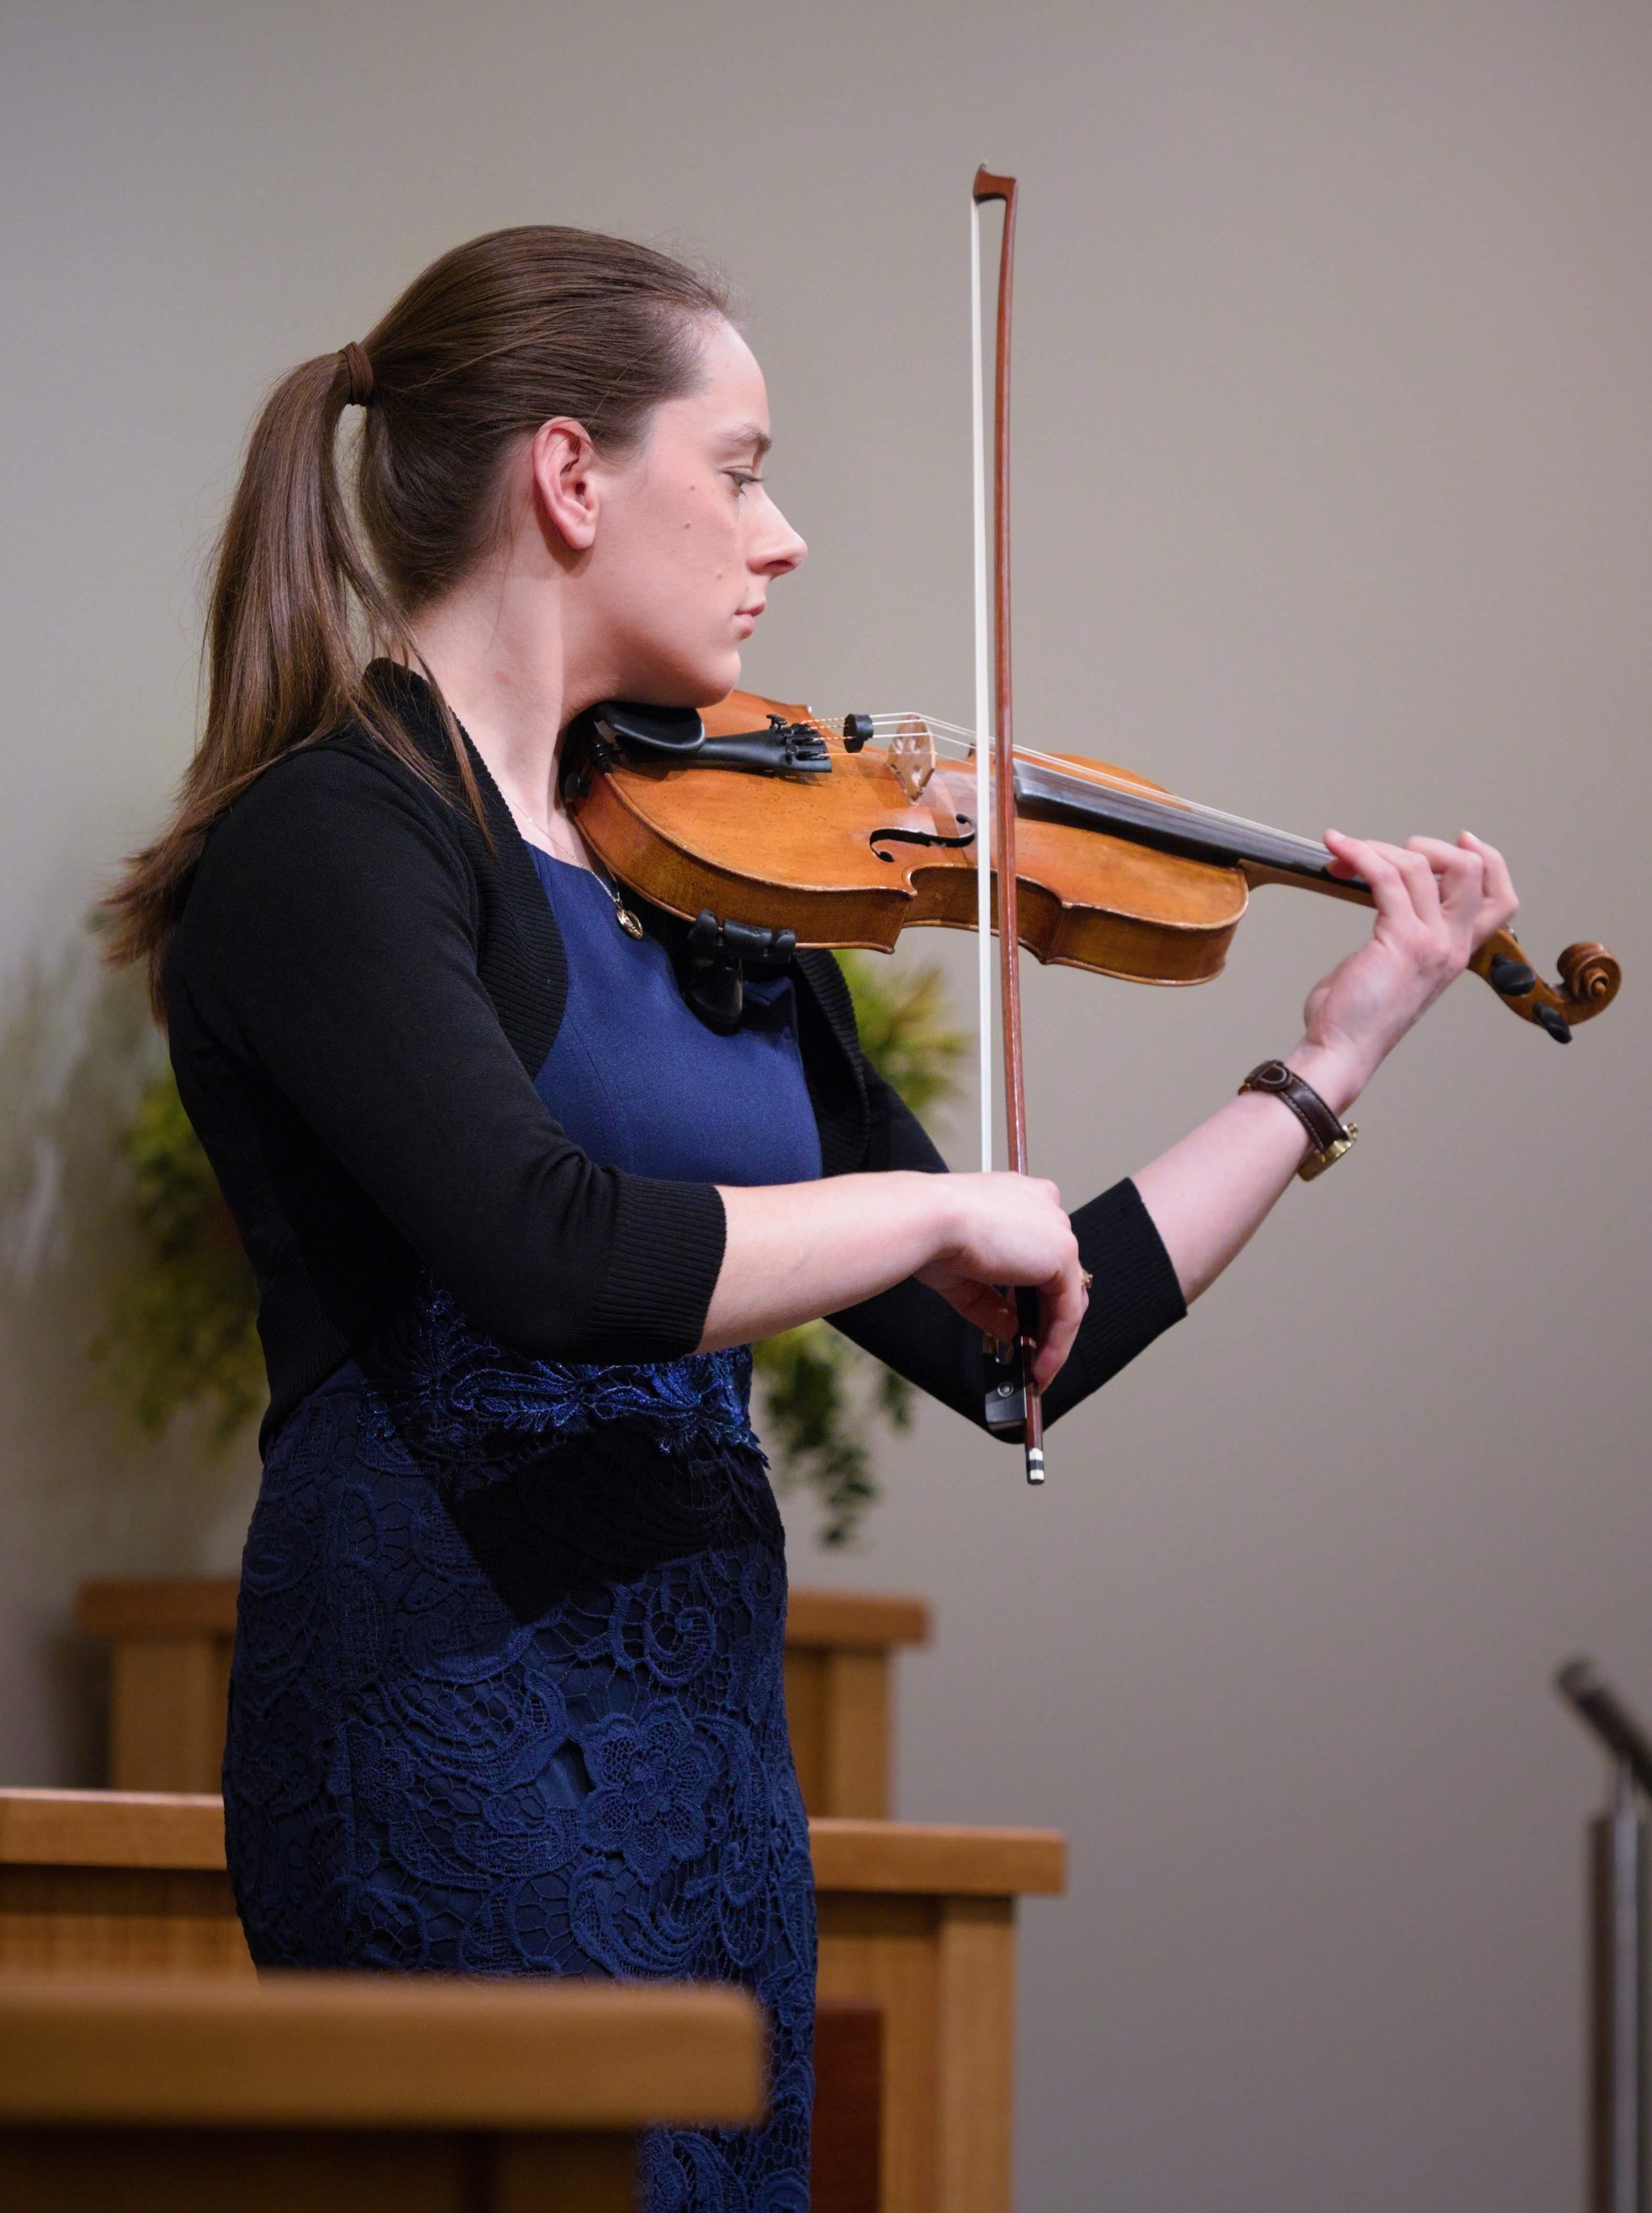 WGE Instrumental Taylah Evans Displays Her Skill on the Violin